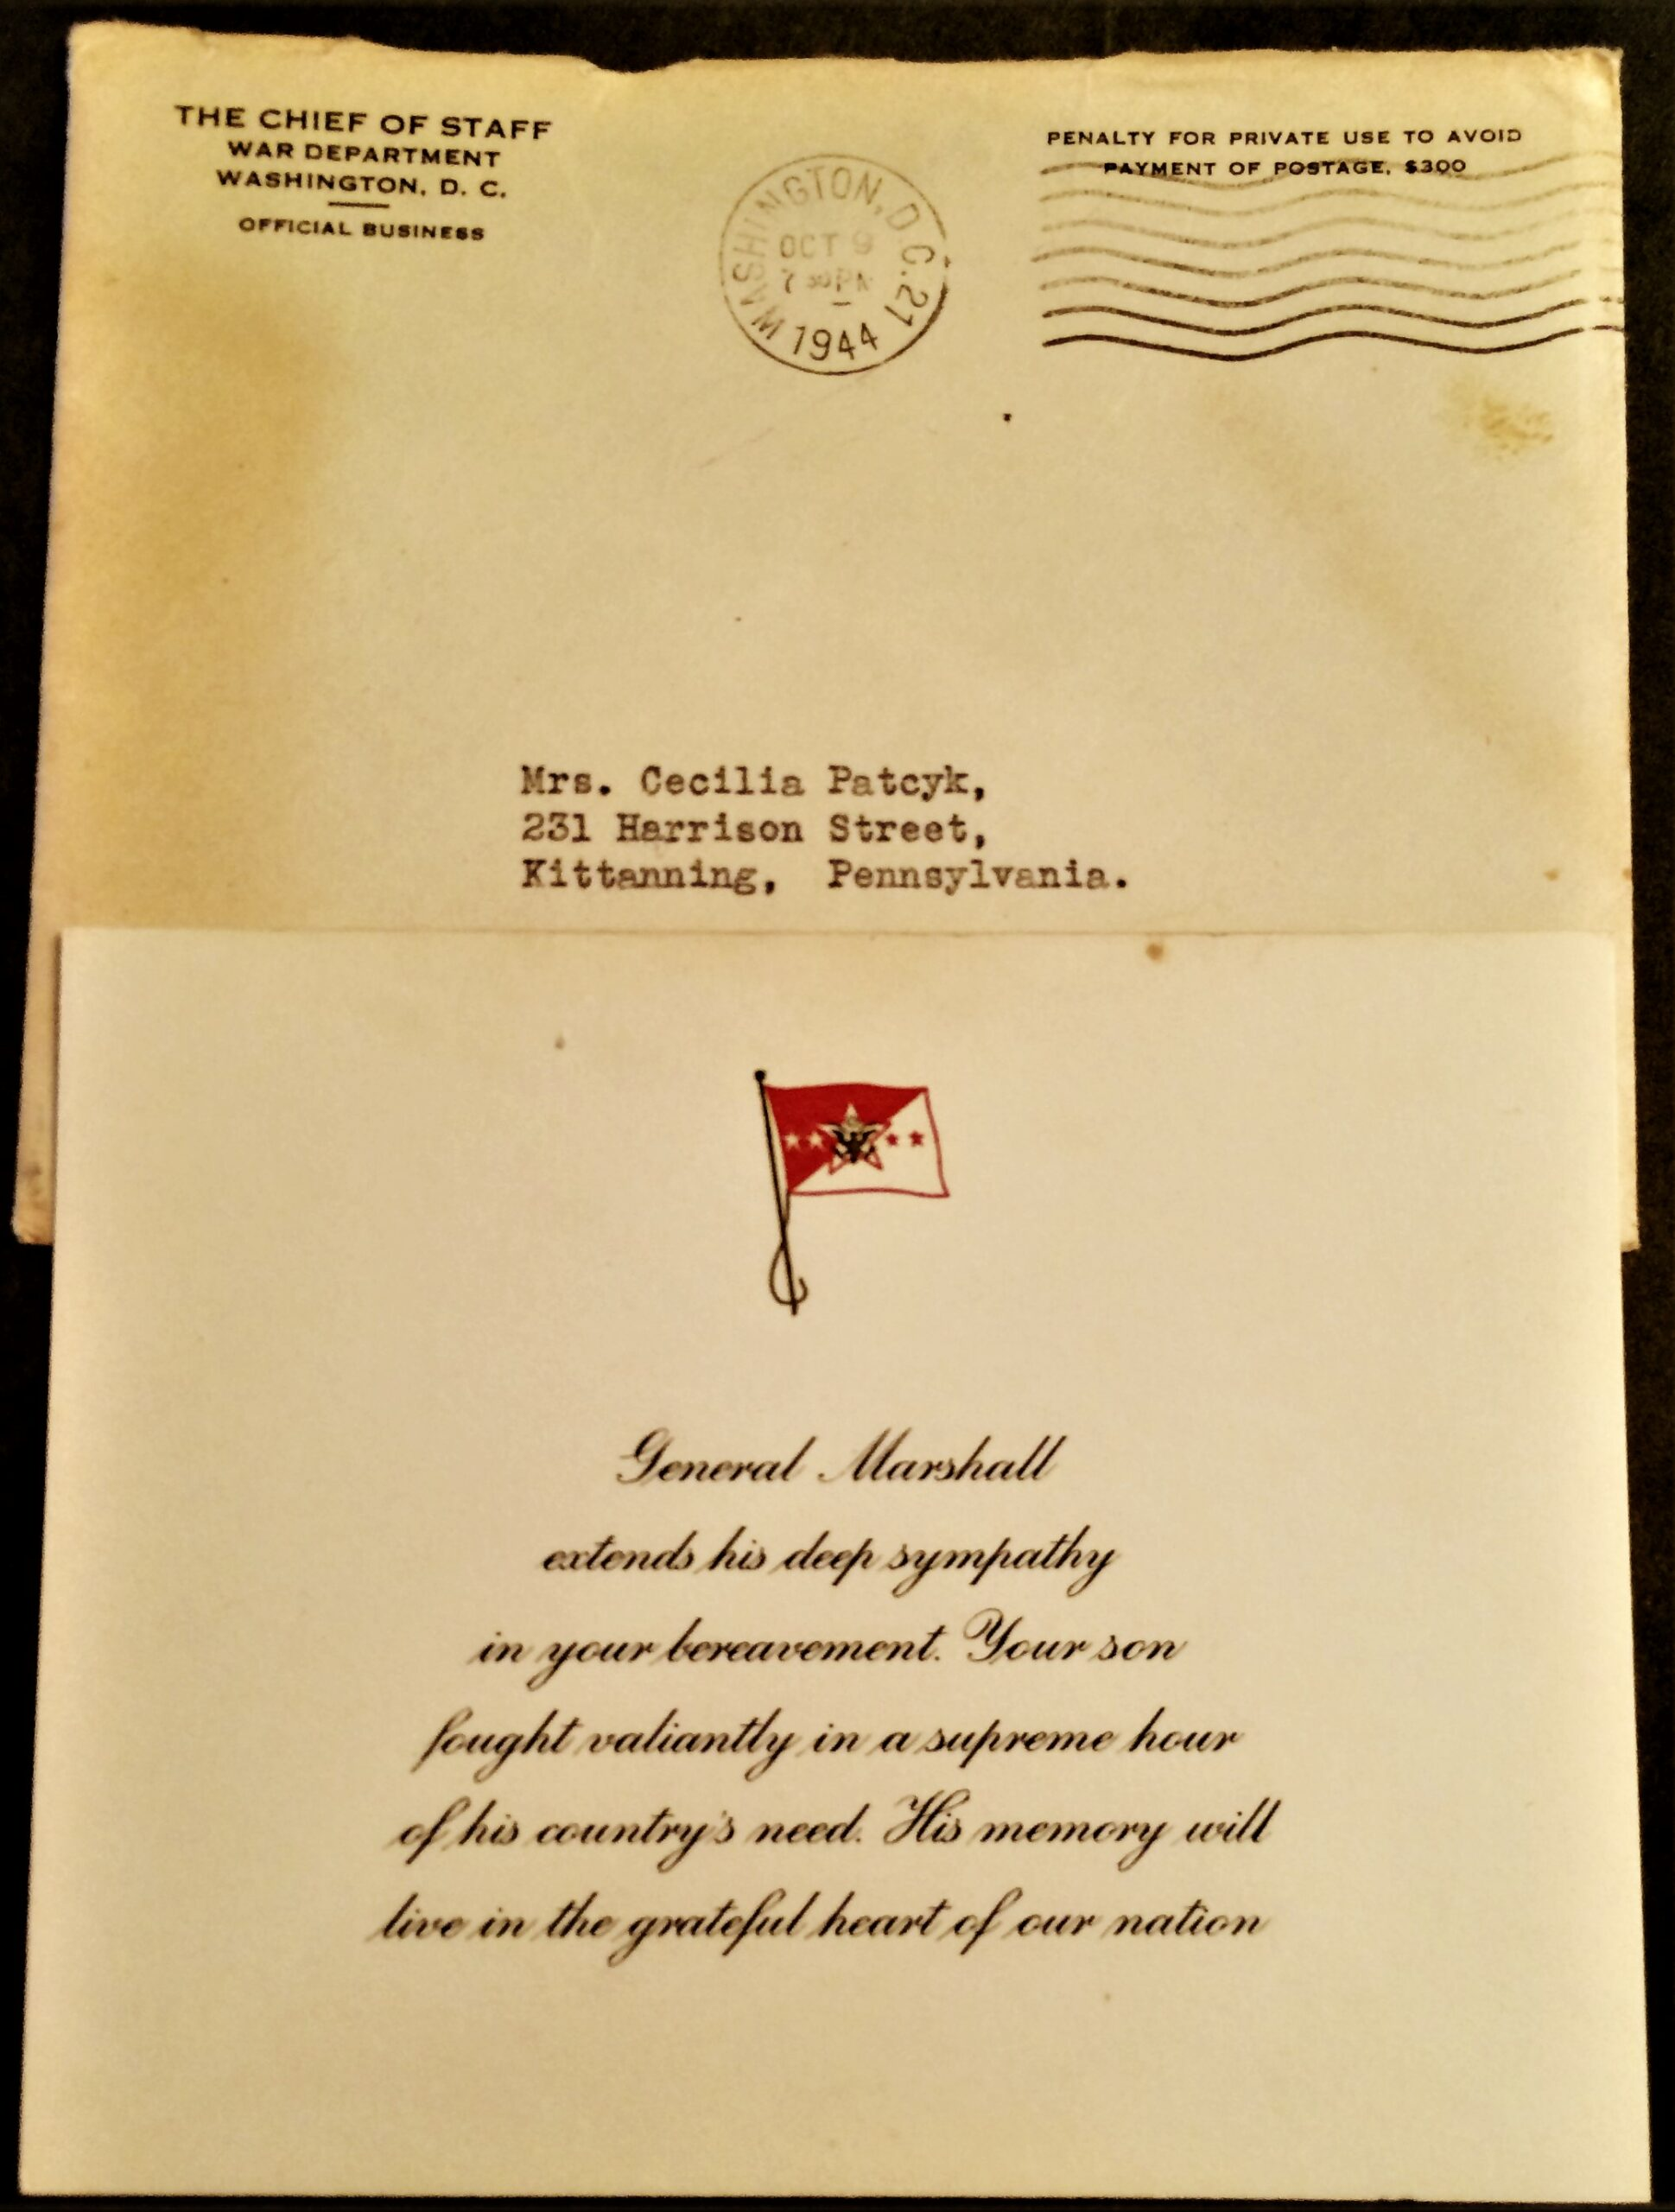 Sympathy Card 9 October 1944 (Courtesy Carleen Dunne)